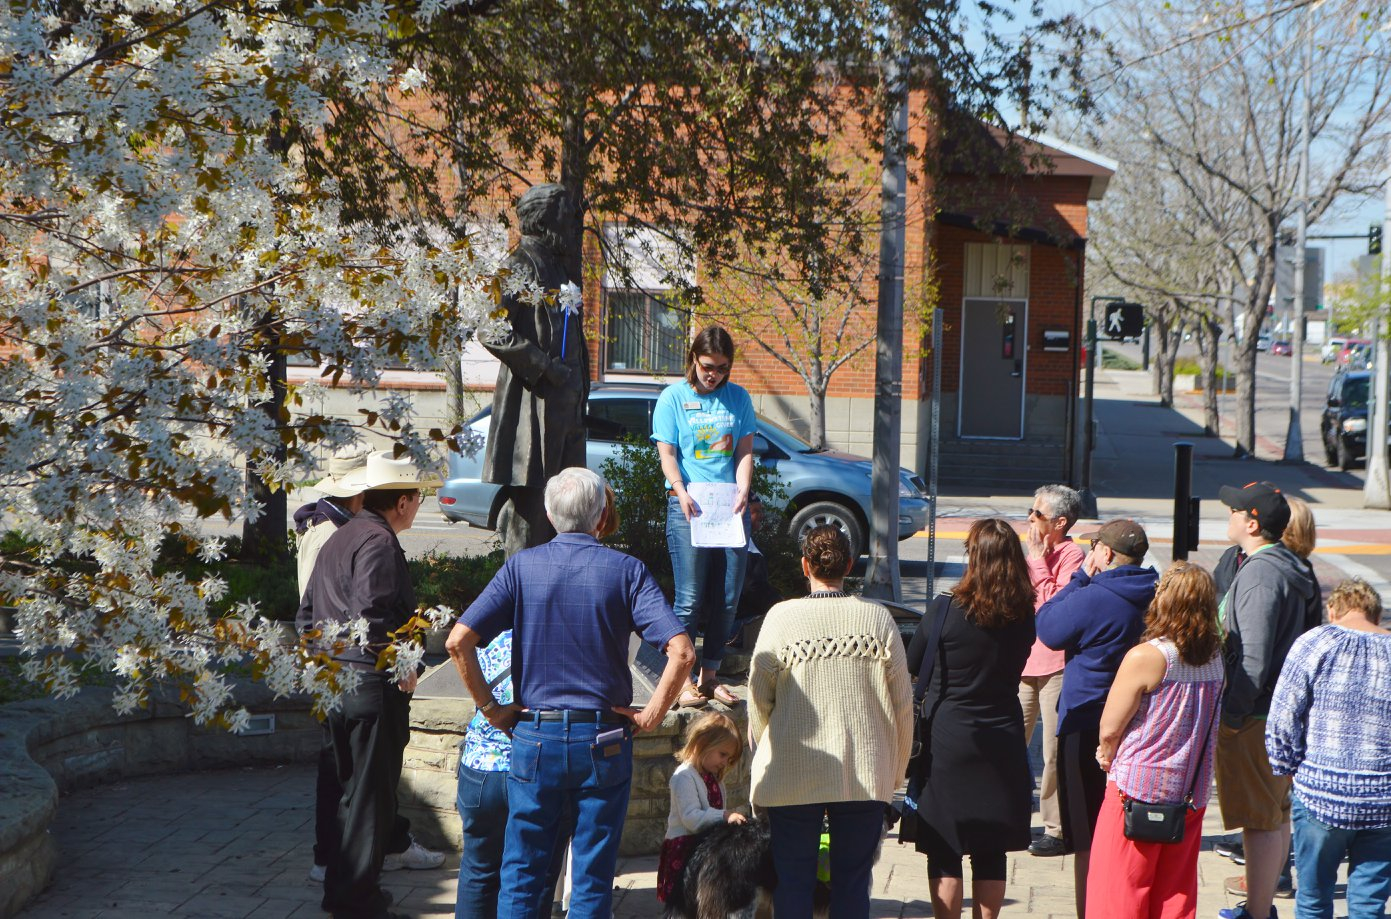 Whc: North Elevation Neighborhood Architecture Walking Tour – Downtown  Billings Alliance In Billings School District 2 Calander